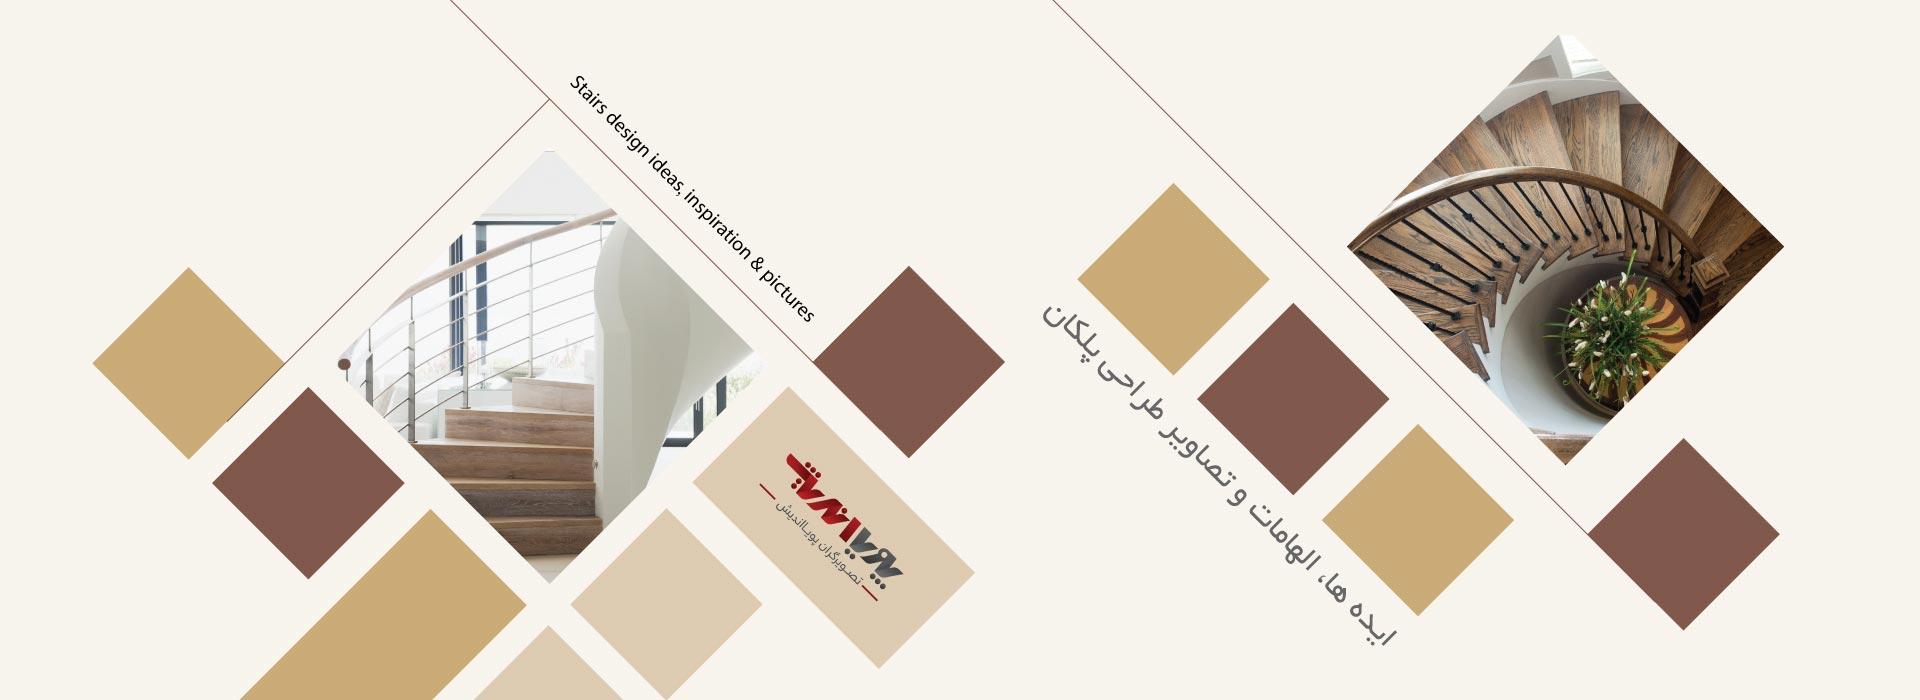 stairs banner - ایده ها، الهامات و تصاویر طراحی پلکان